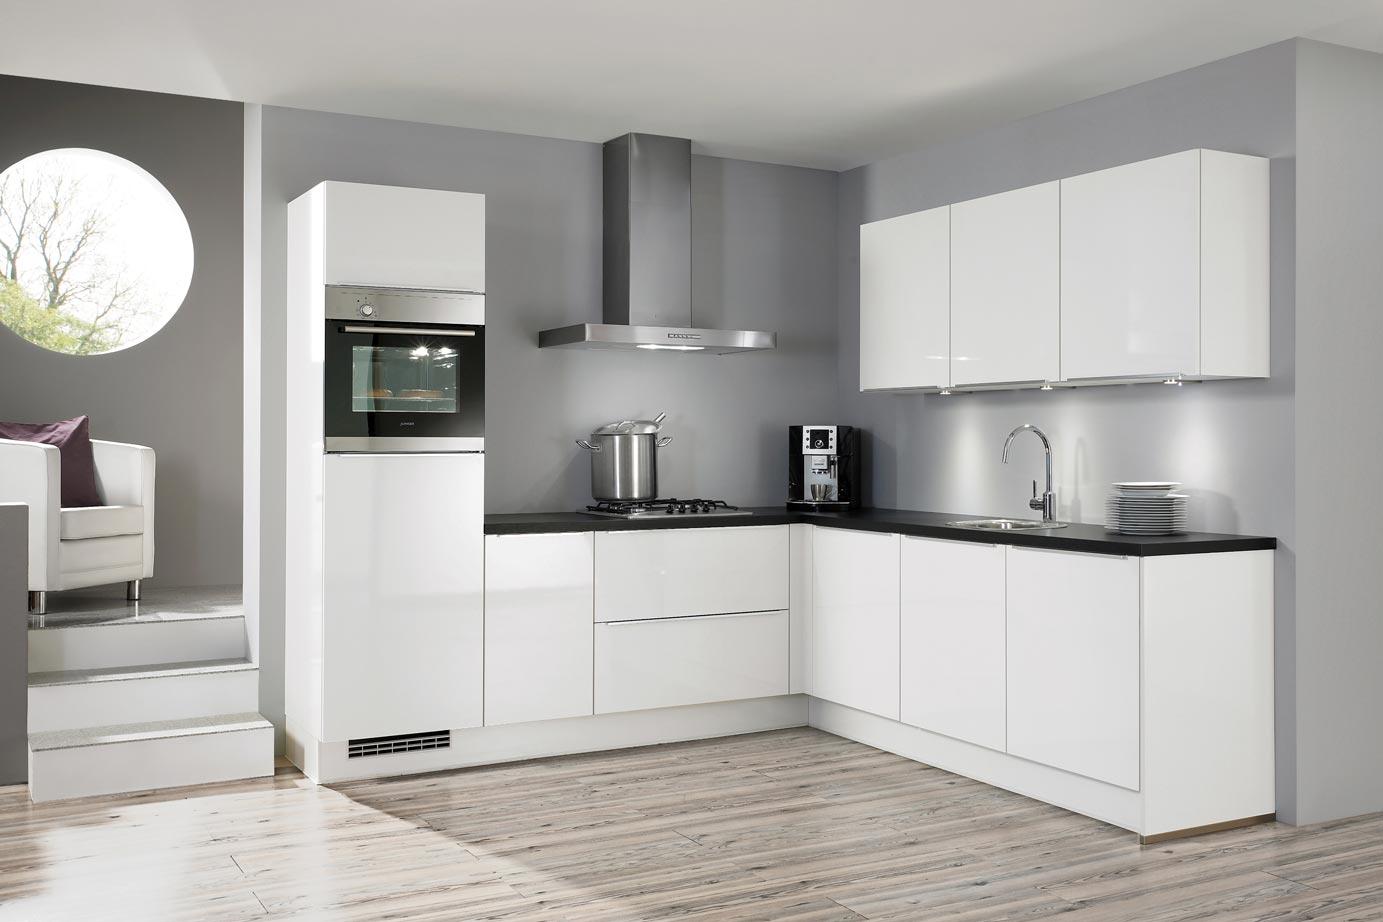 Keuken Zwart Blad : Hoogglans keuken. chique in modern interieur! db keukens